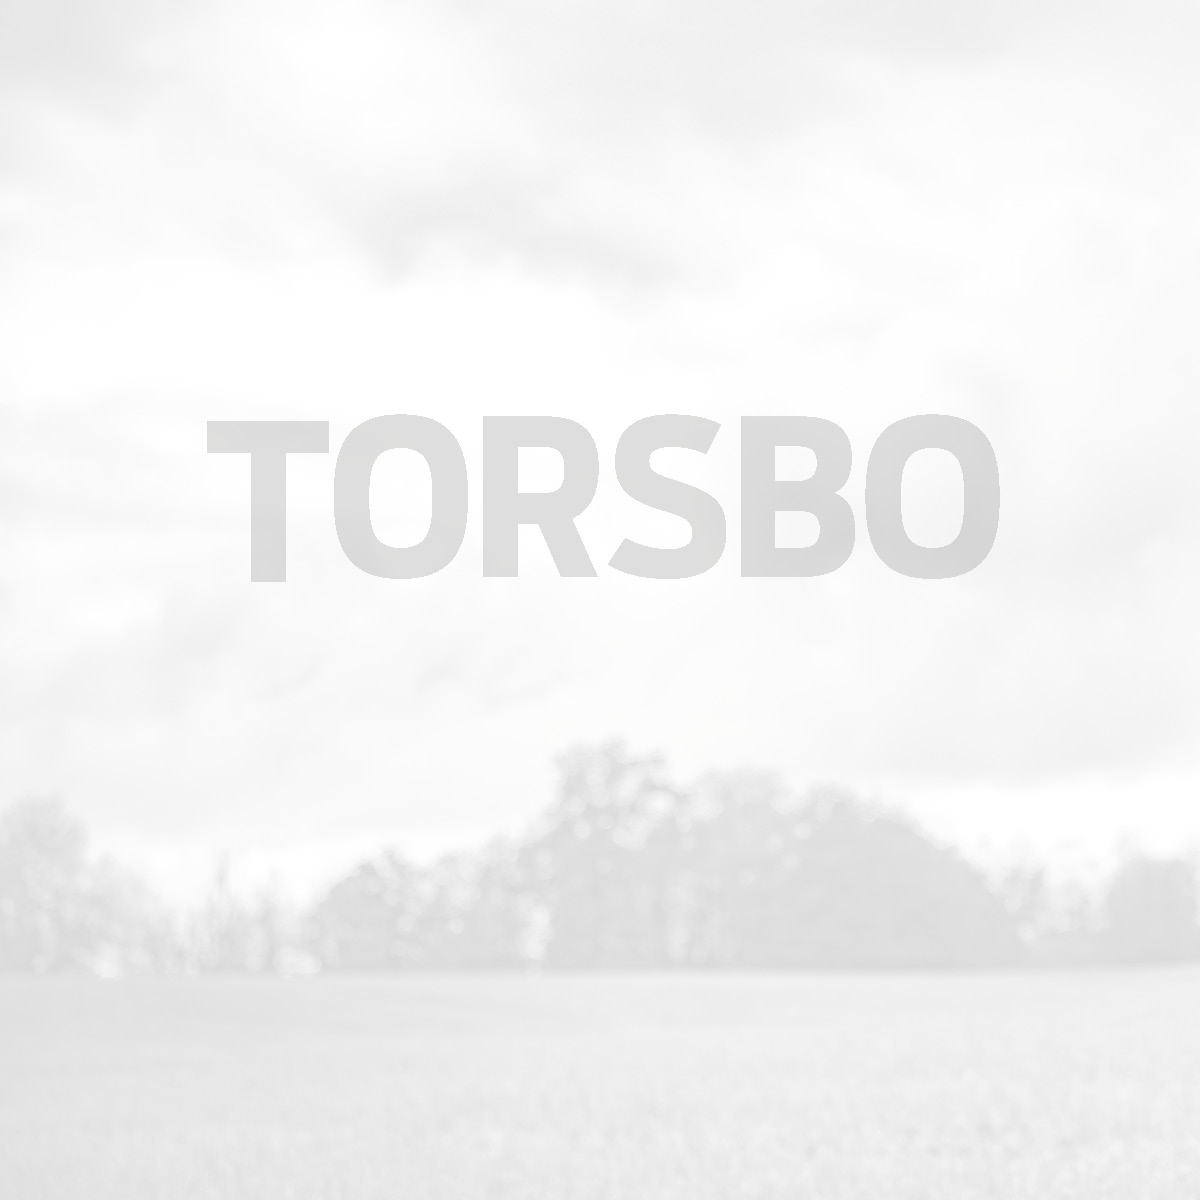 Barnes .270 Win TTSX BT Vor-Tx